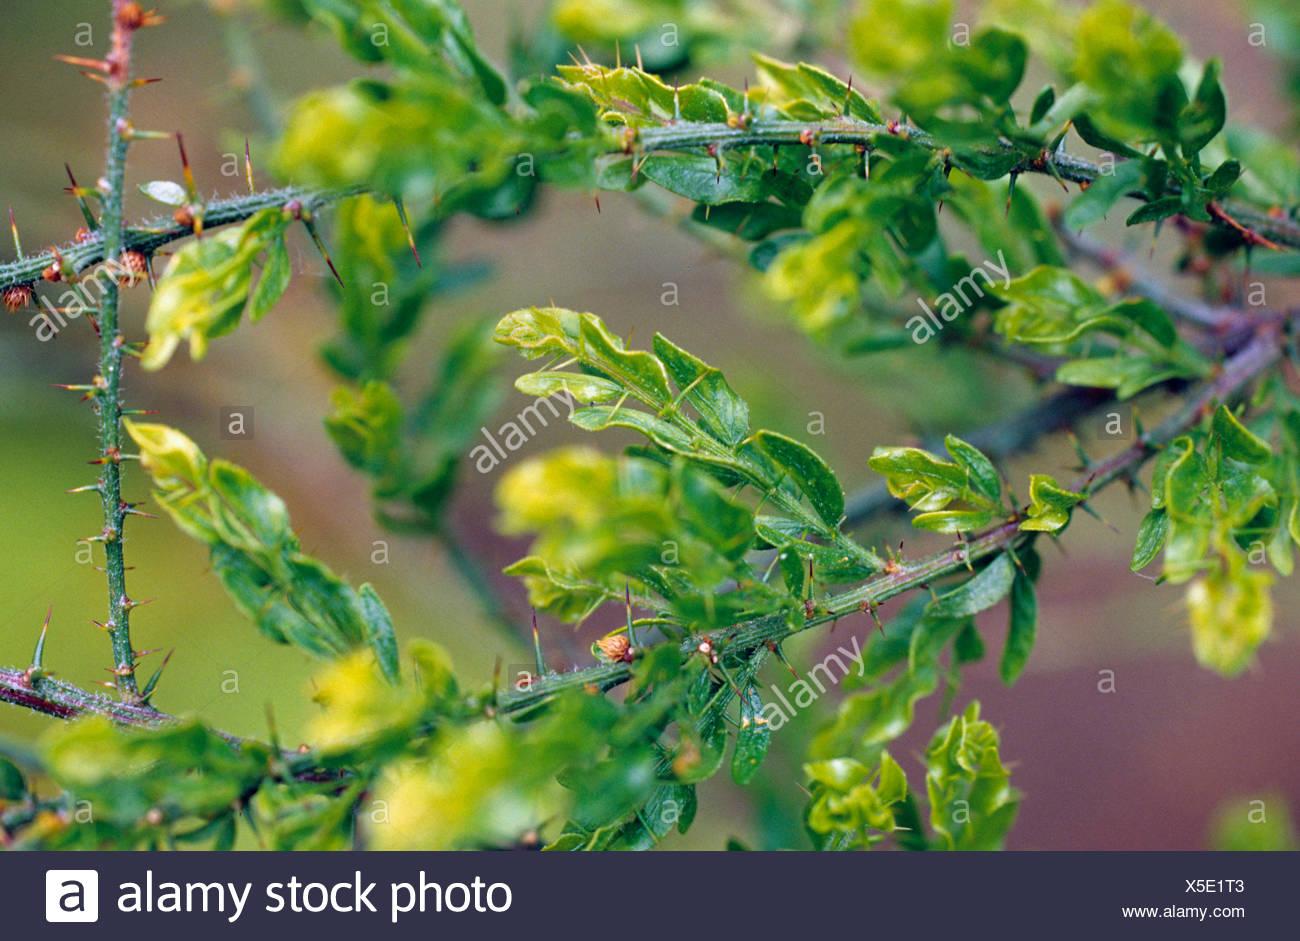 Kangaroo thorn, Prickly Wattle, Paradox Acacia (Acacia paradoxa, Acacia armata), branches Stock Photo